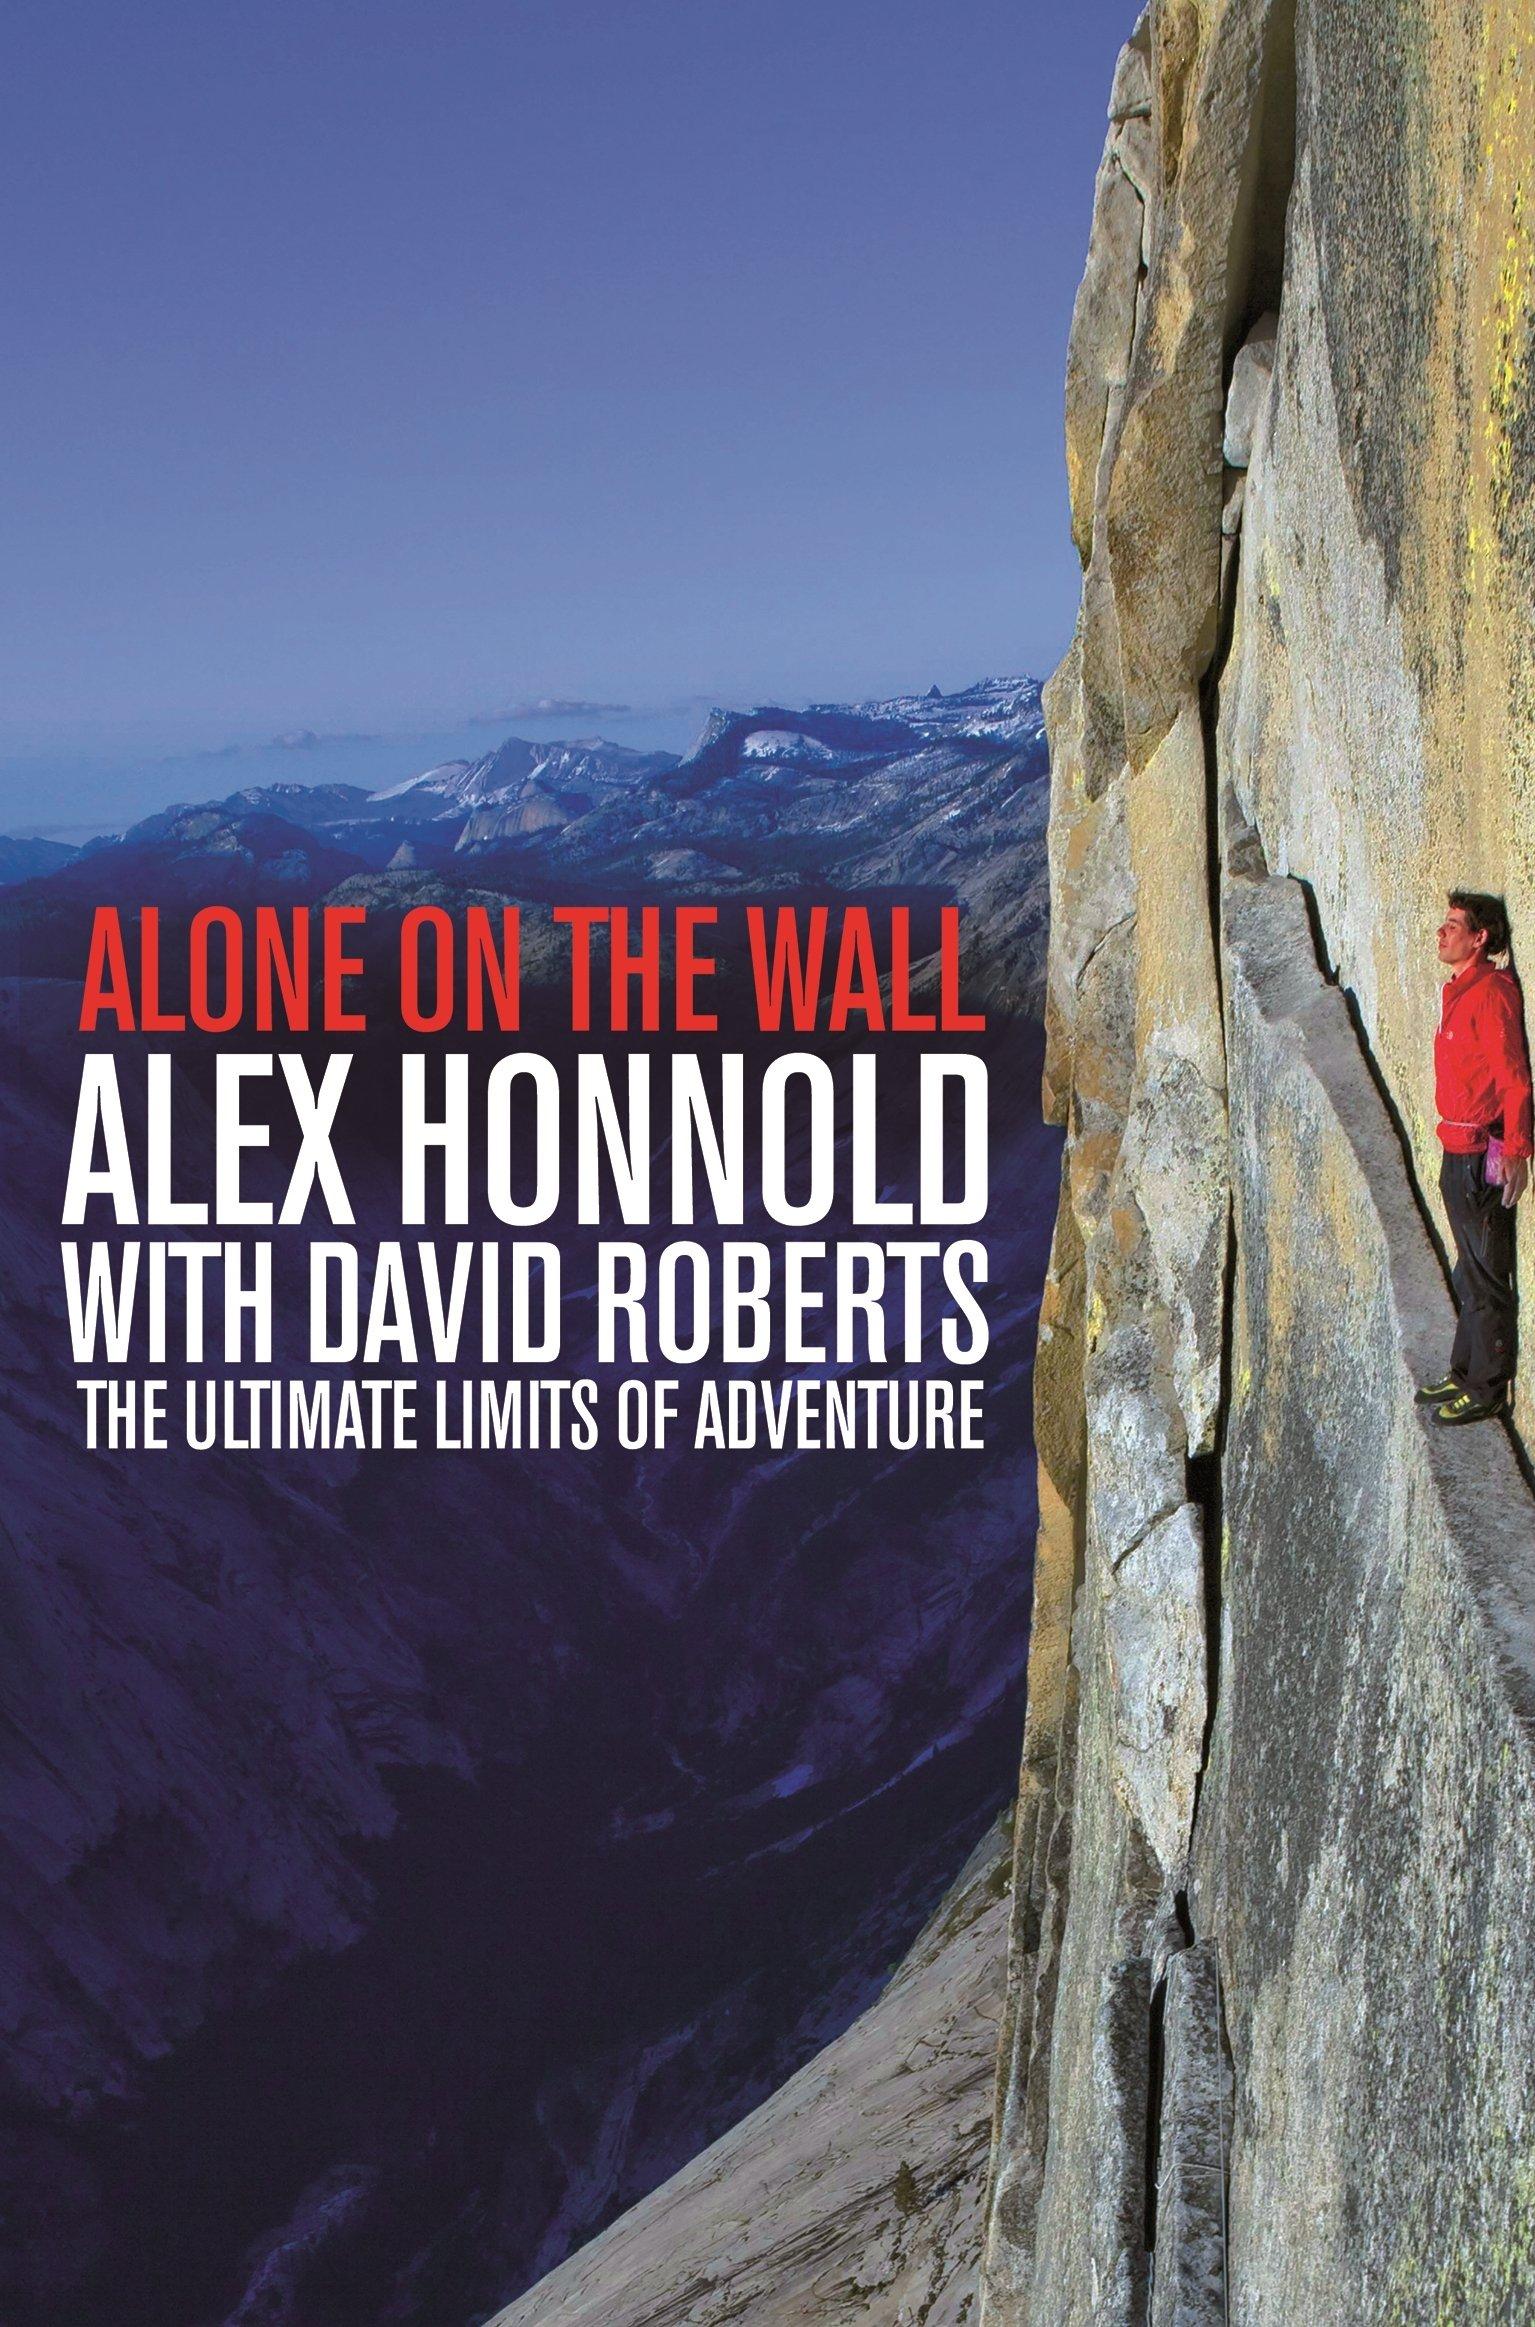 Alone on the Wall 9781447282730 Alex Honnold Pan Macmillan   Klimmen-bergsport Reisinformatie algemeen